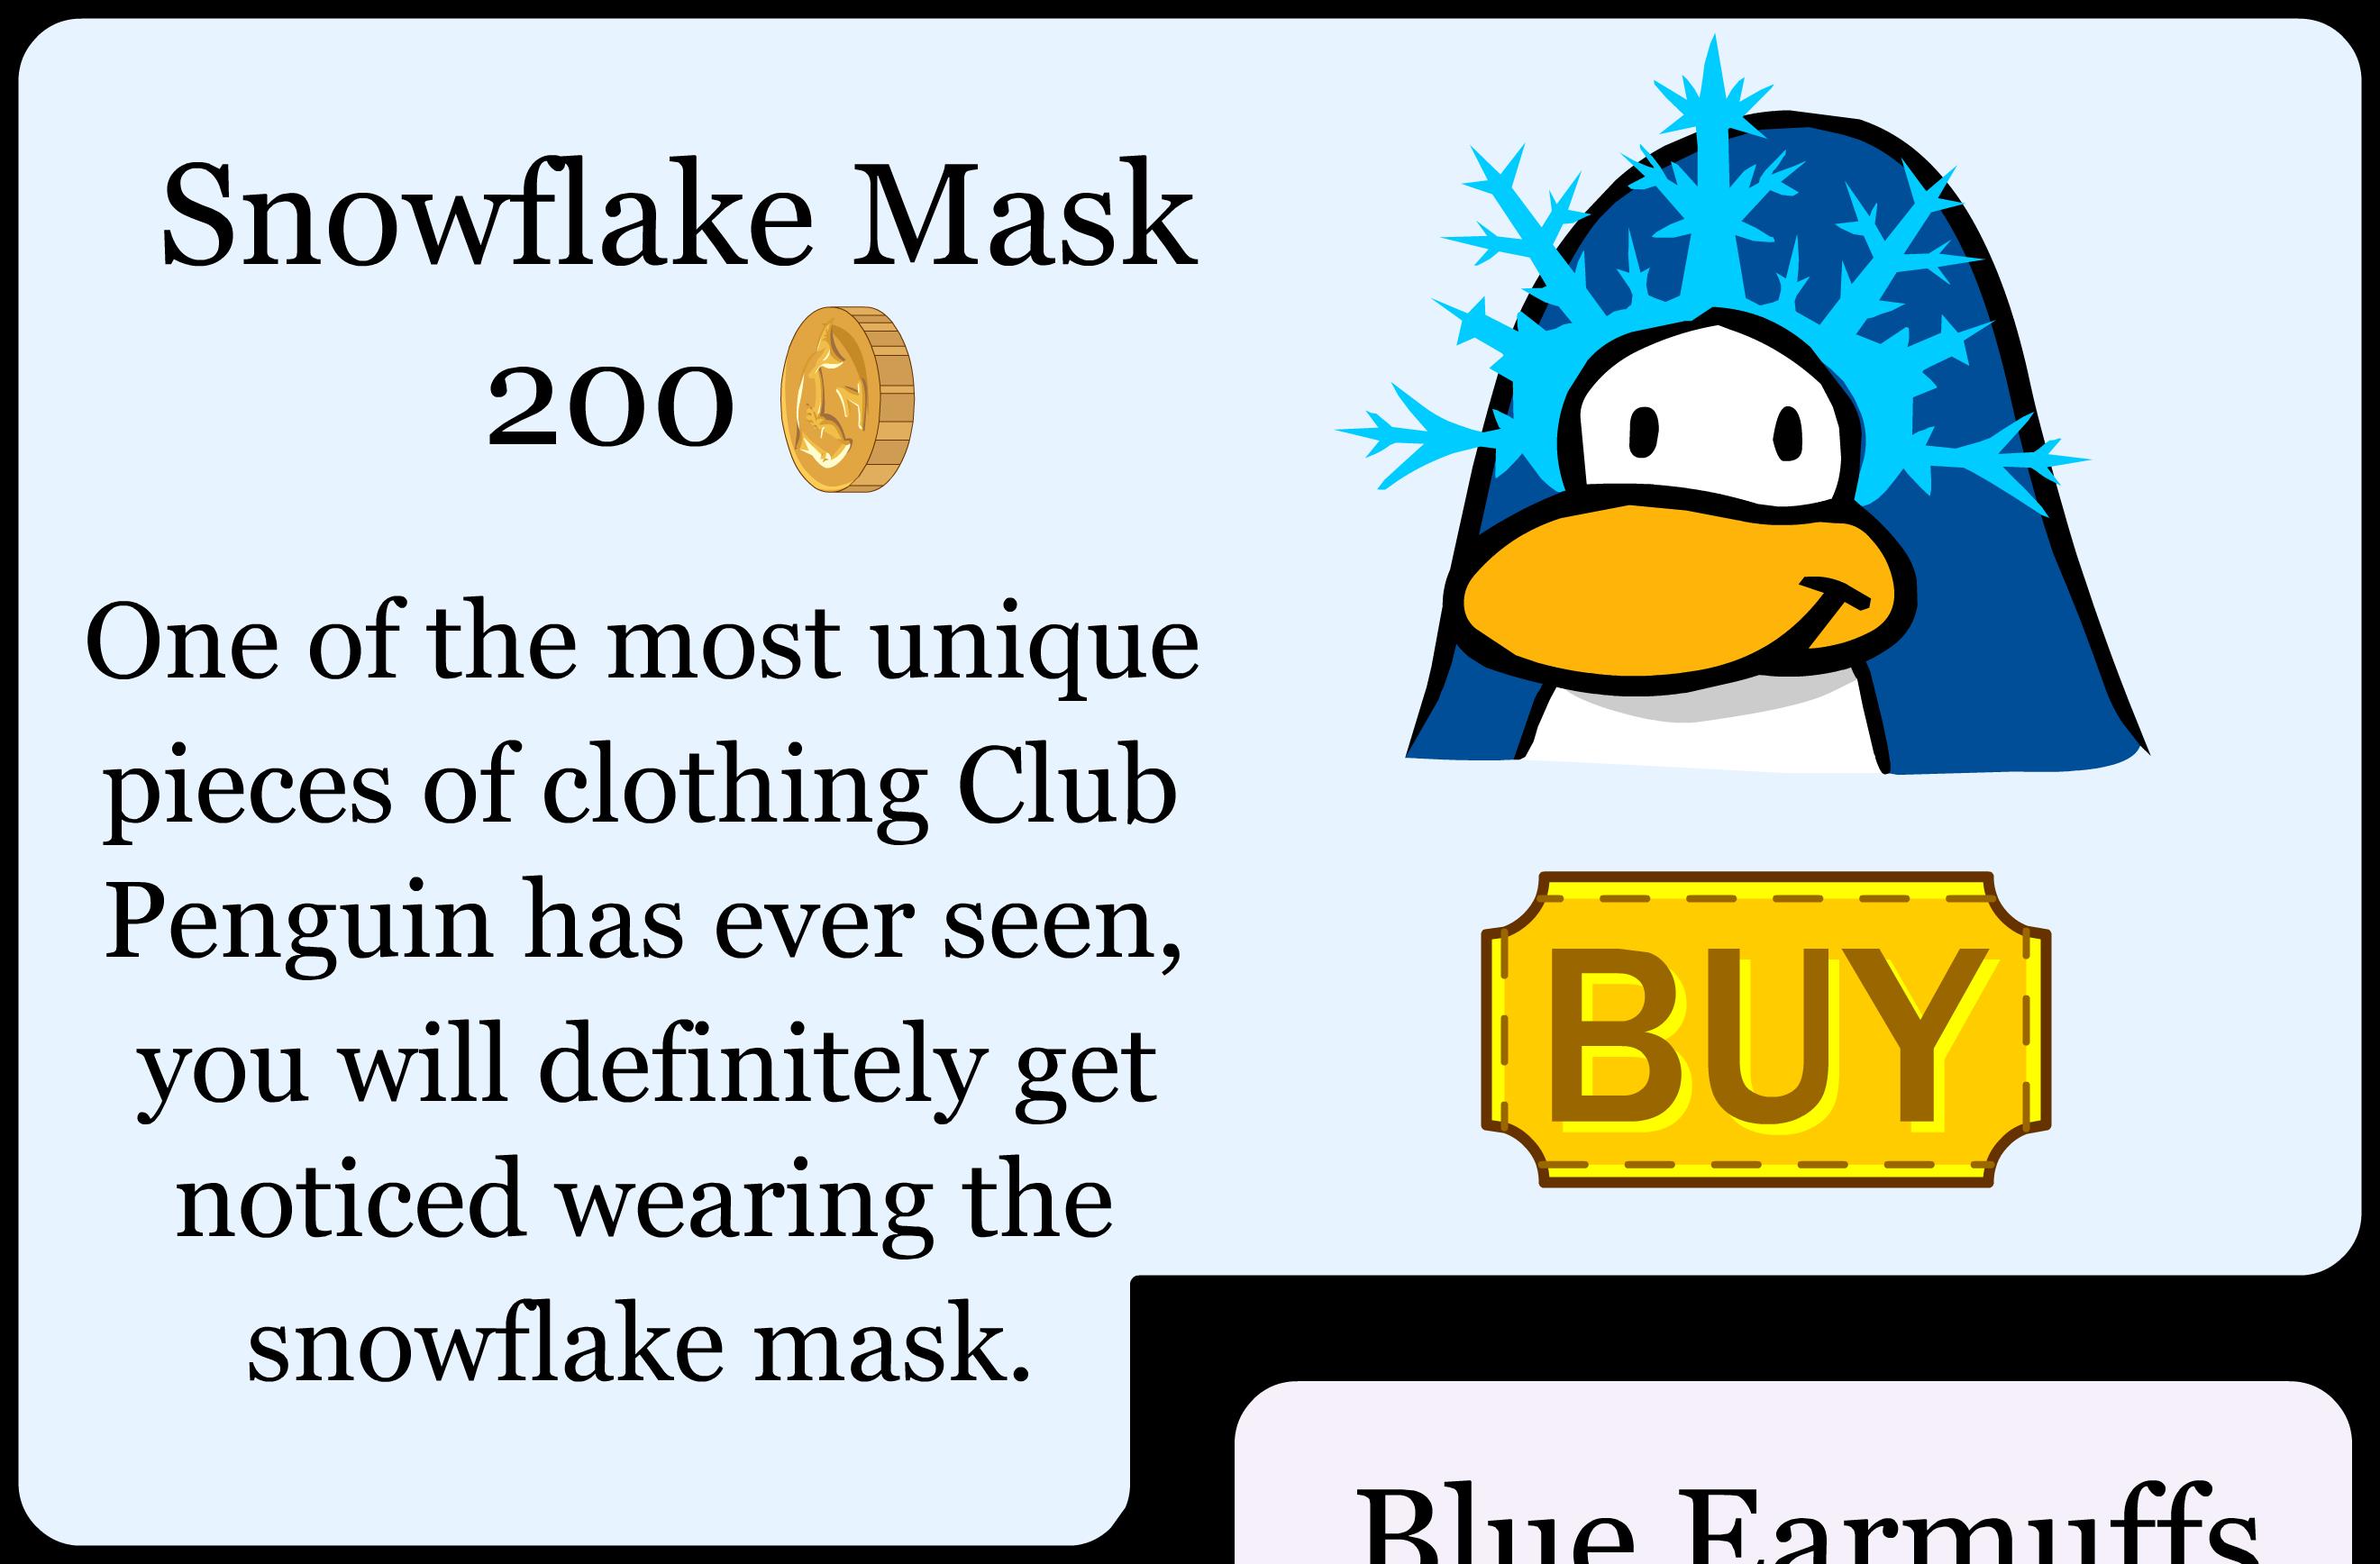 File:Snowflake Mask Catalog.png